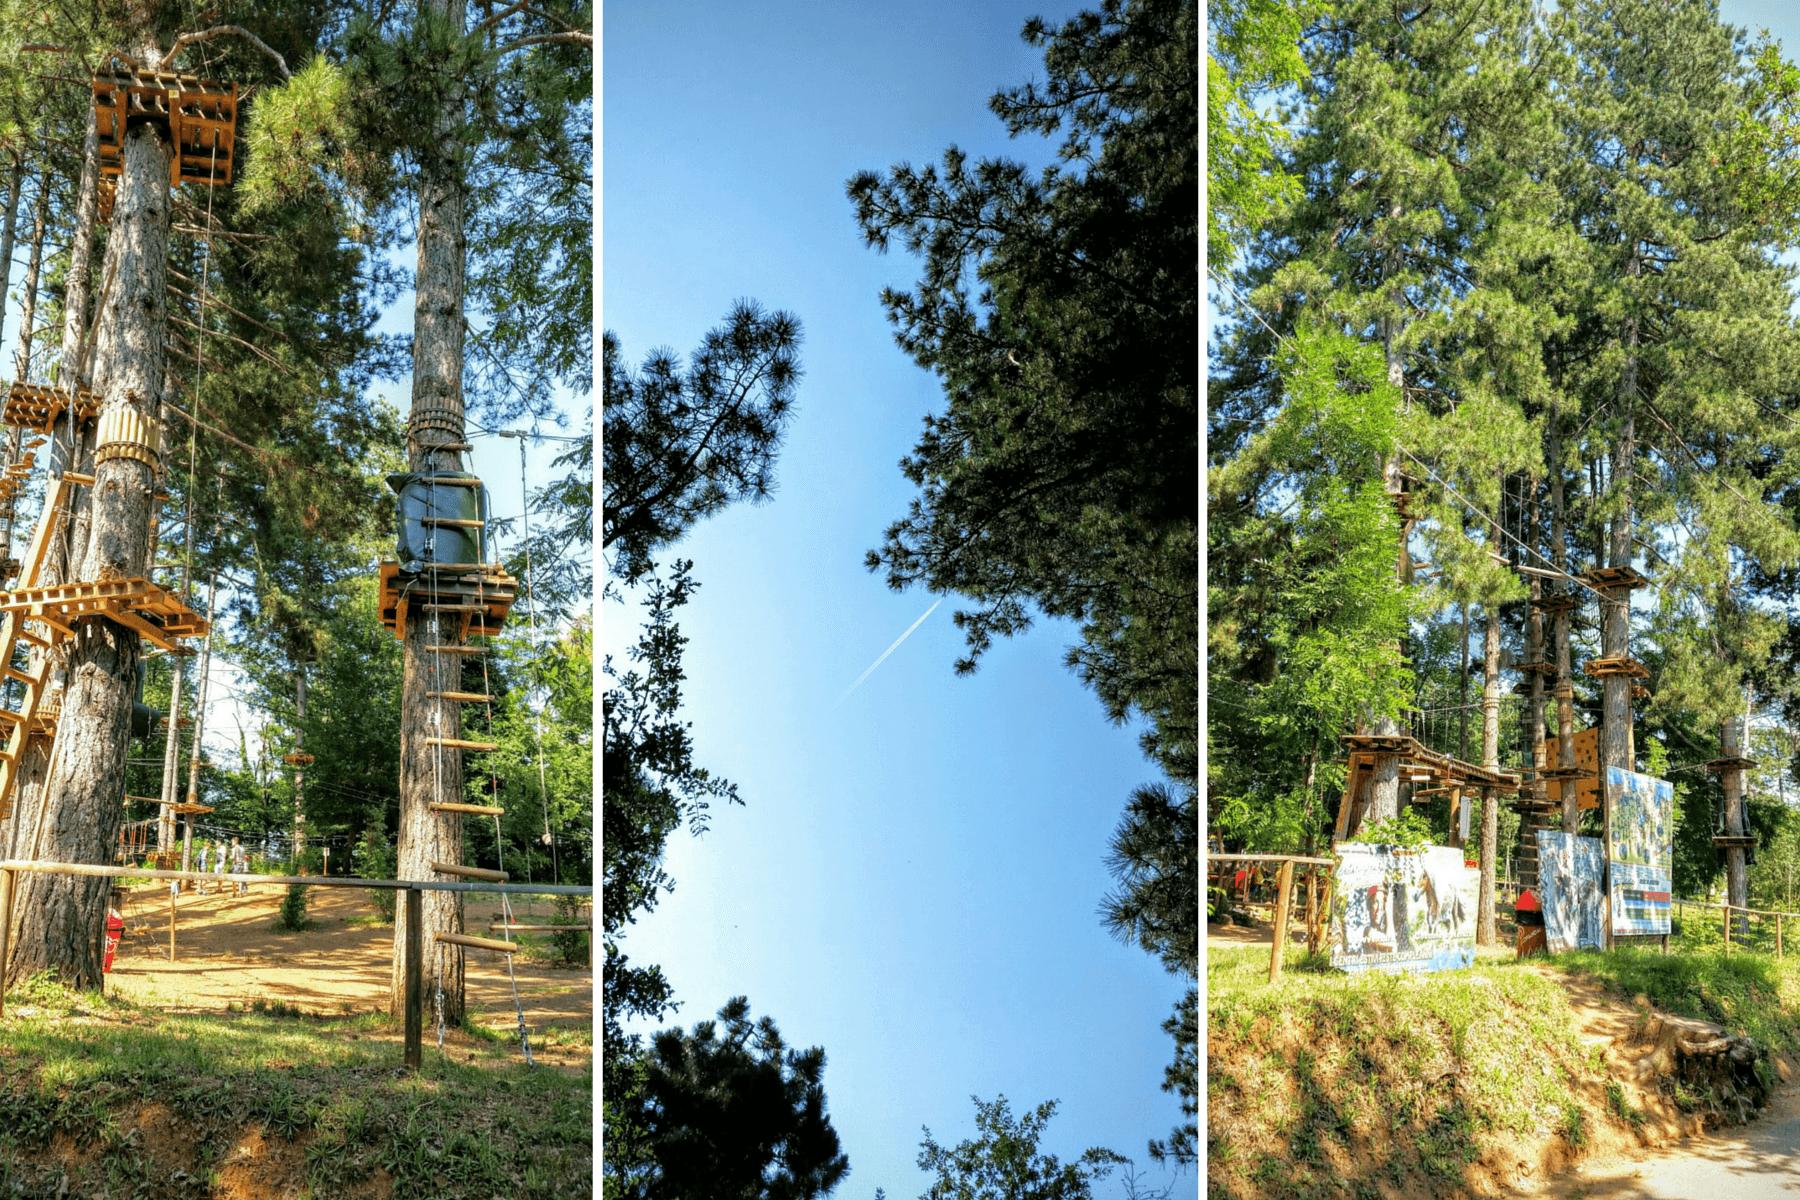 [cml_media_alt id='6517']San Marino Adventure Park[/cml_media_alt]